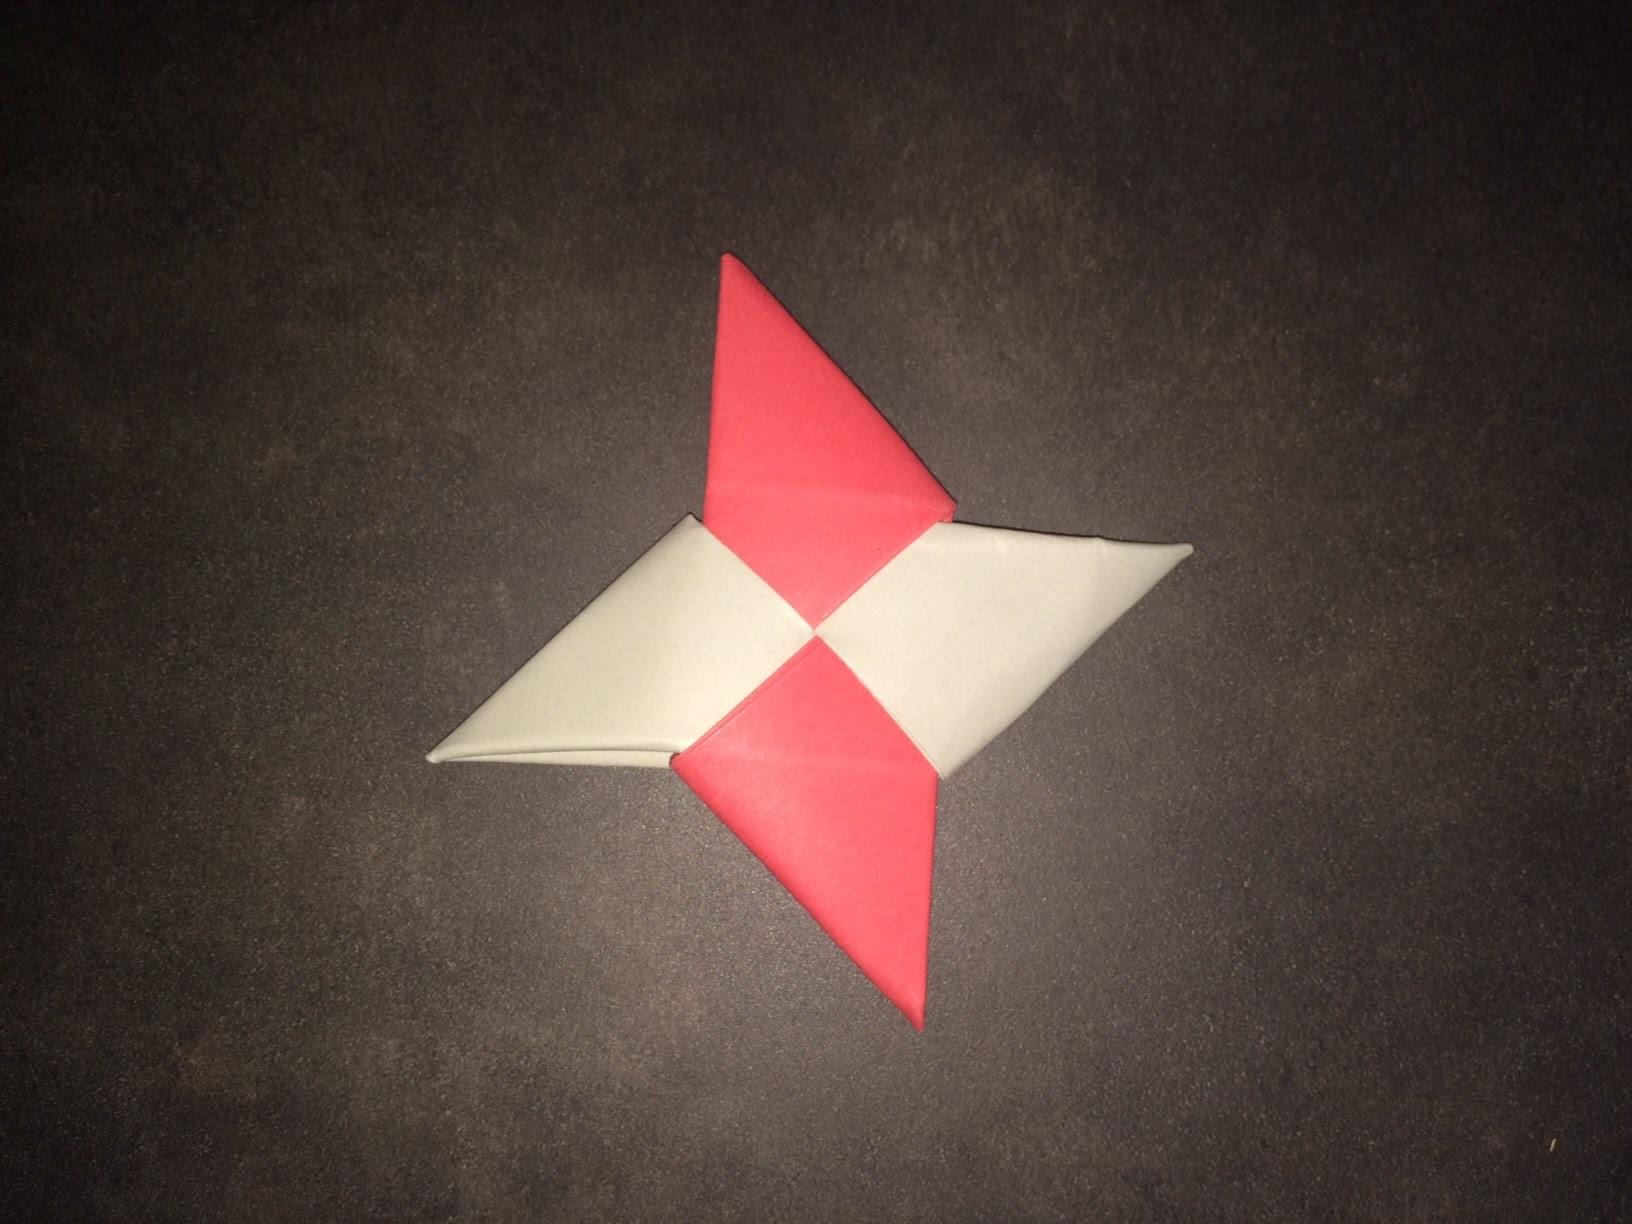 Tuto Origami : Etoile Shuriken Facile